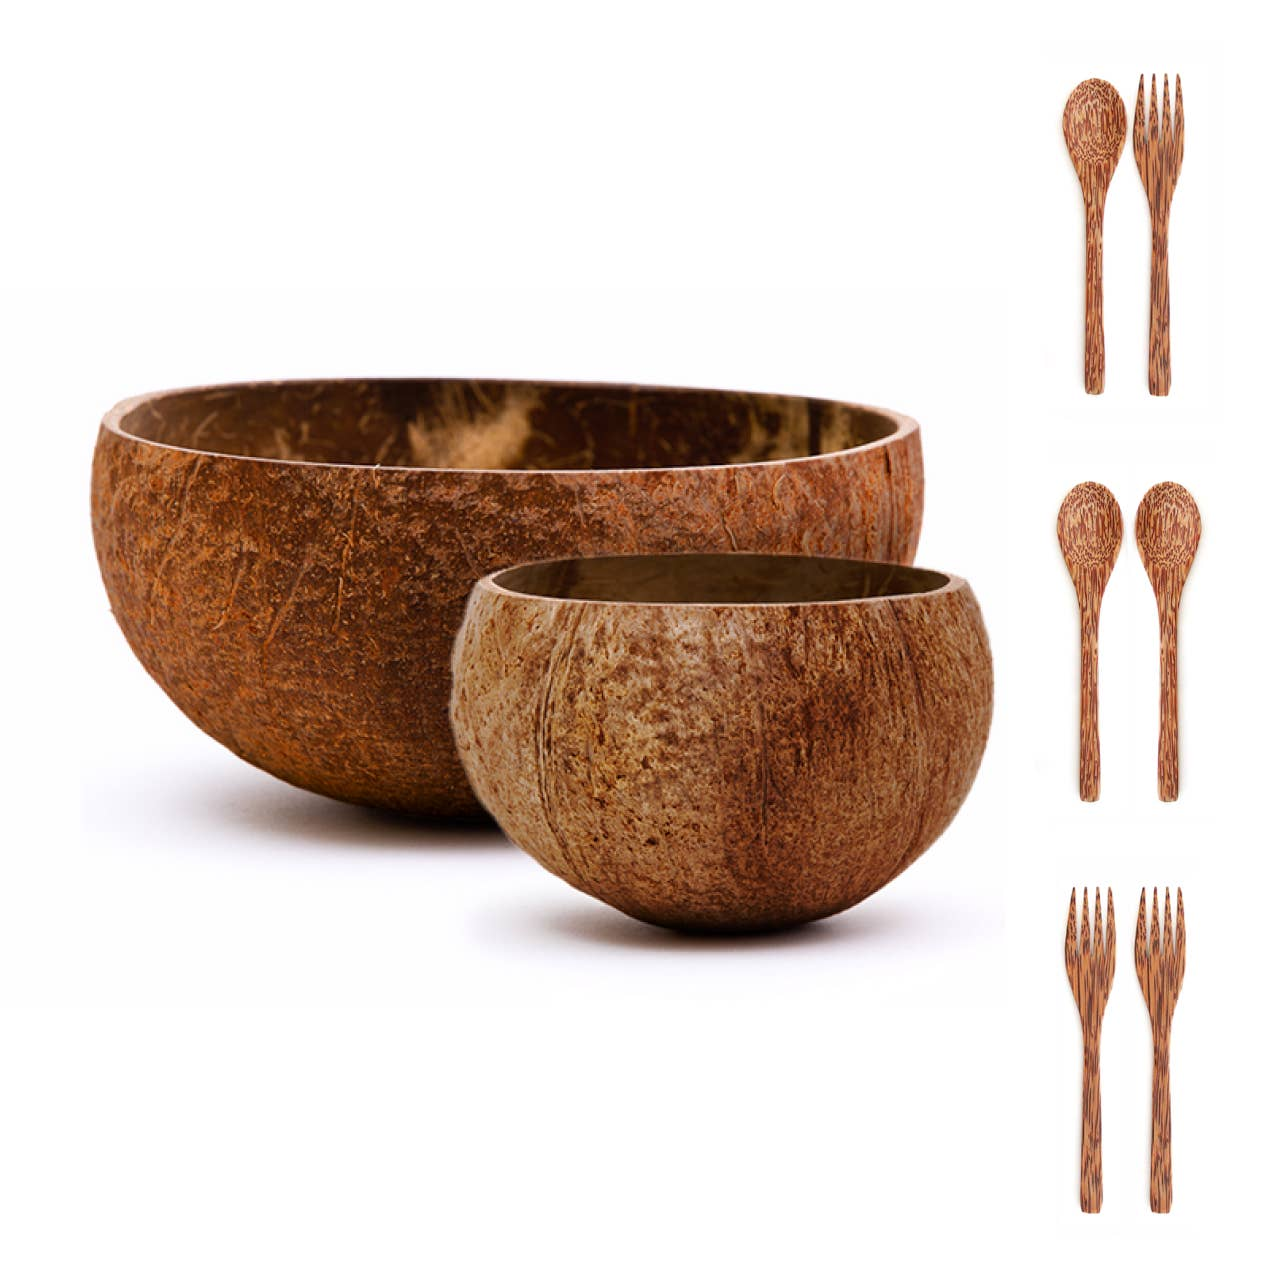 wood chopsticks wood bowl set natural bowl set Handmade Coconut Bowl Set fair trade bowl wood spoon coconut bowl fair trade